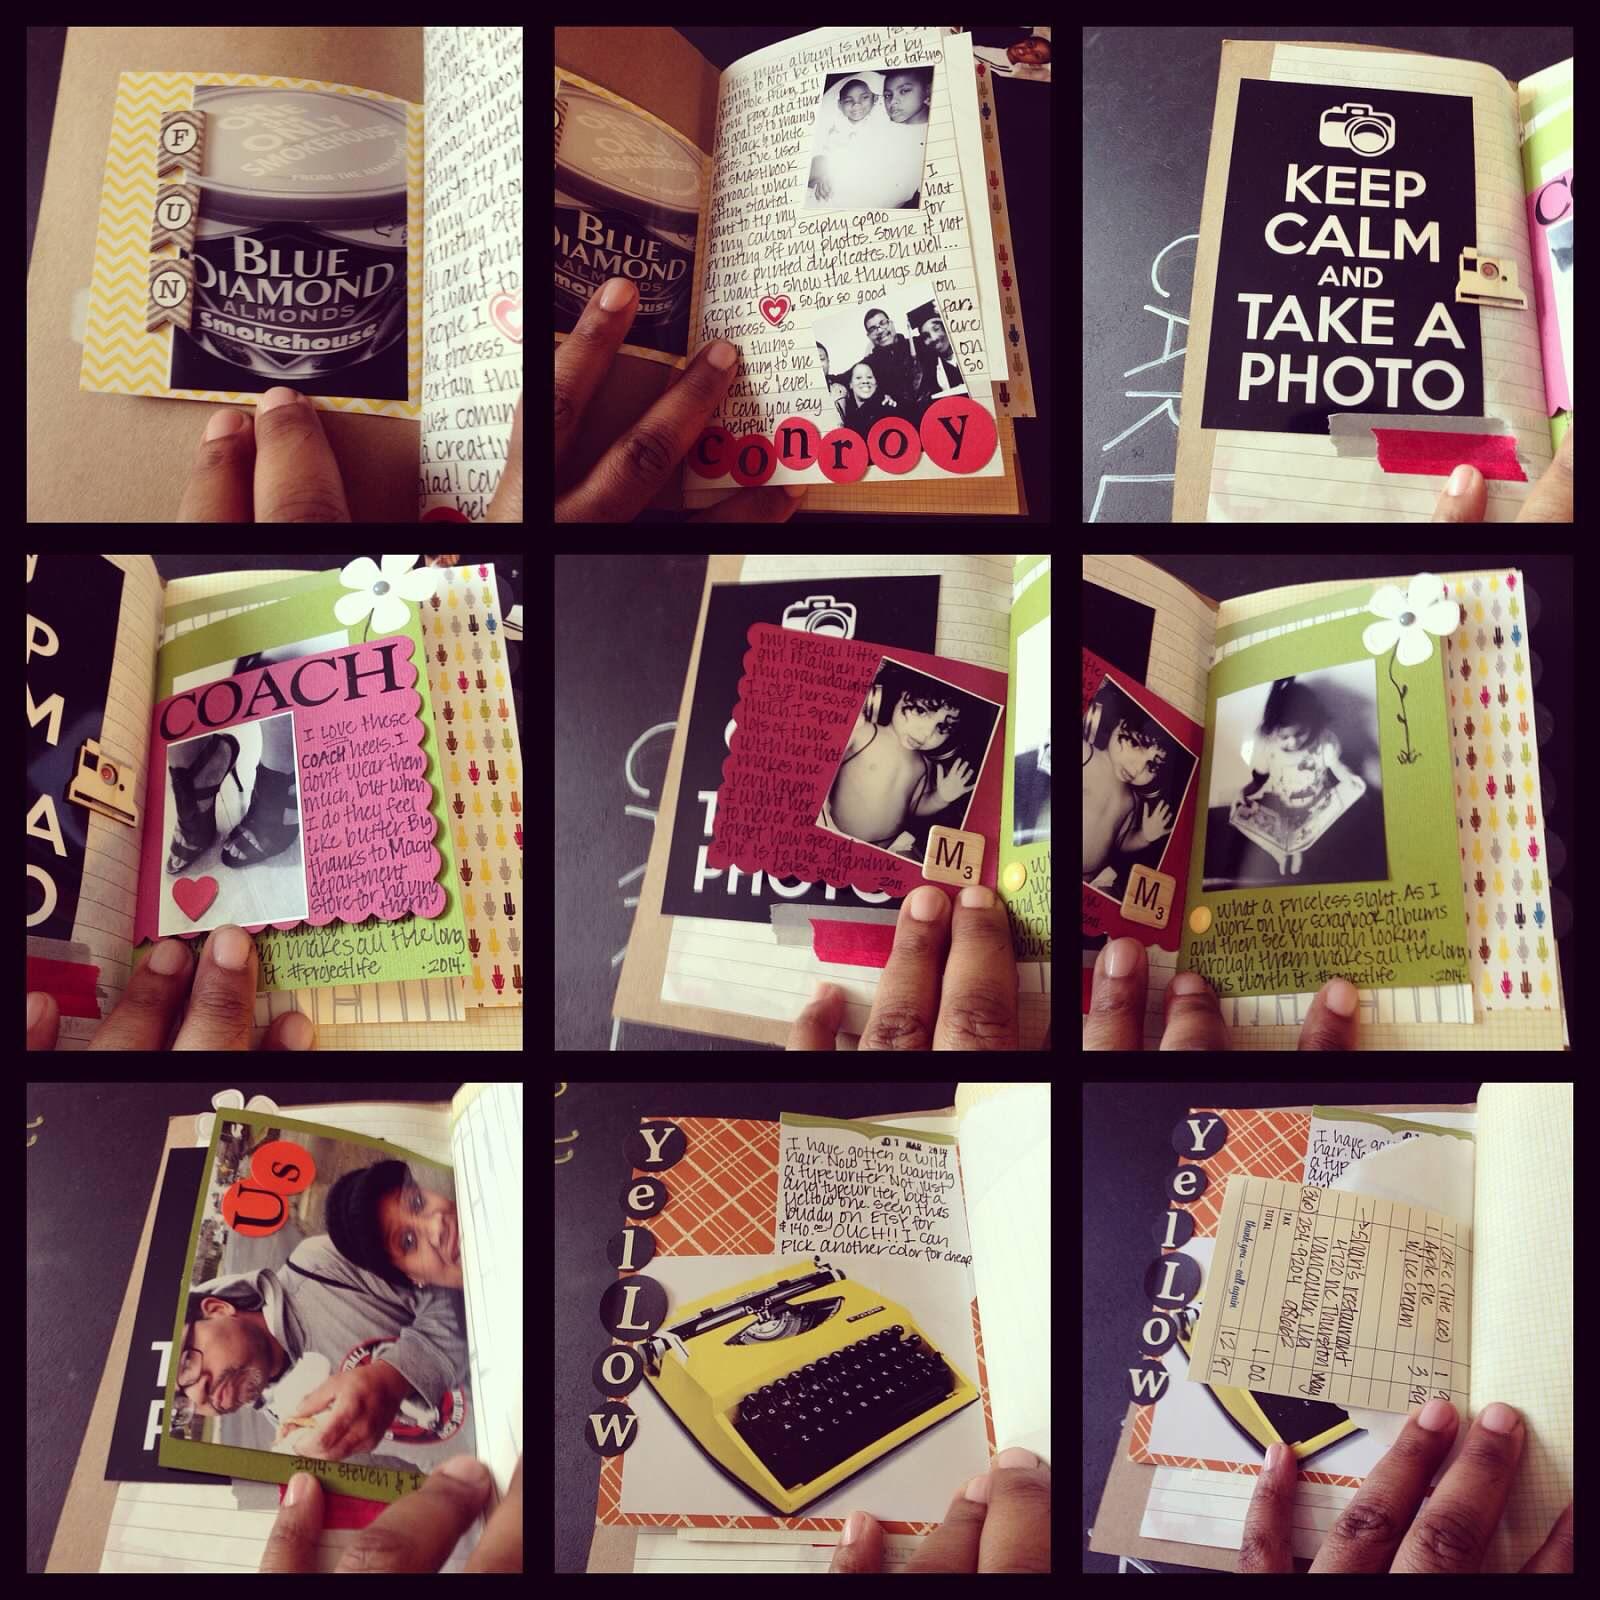 #artjournal #scrapbook #scrapbooking #smashbook #projectlife #creative #memories #photojournal #family #minibook